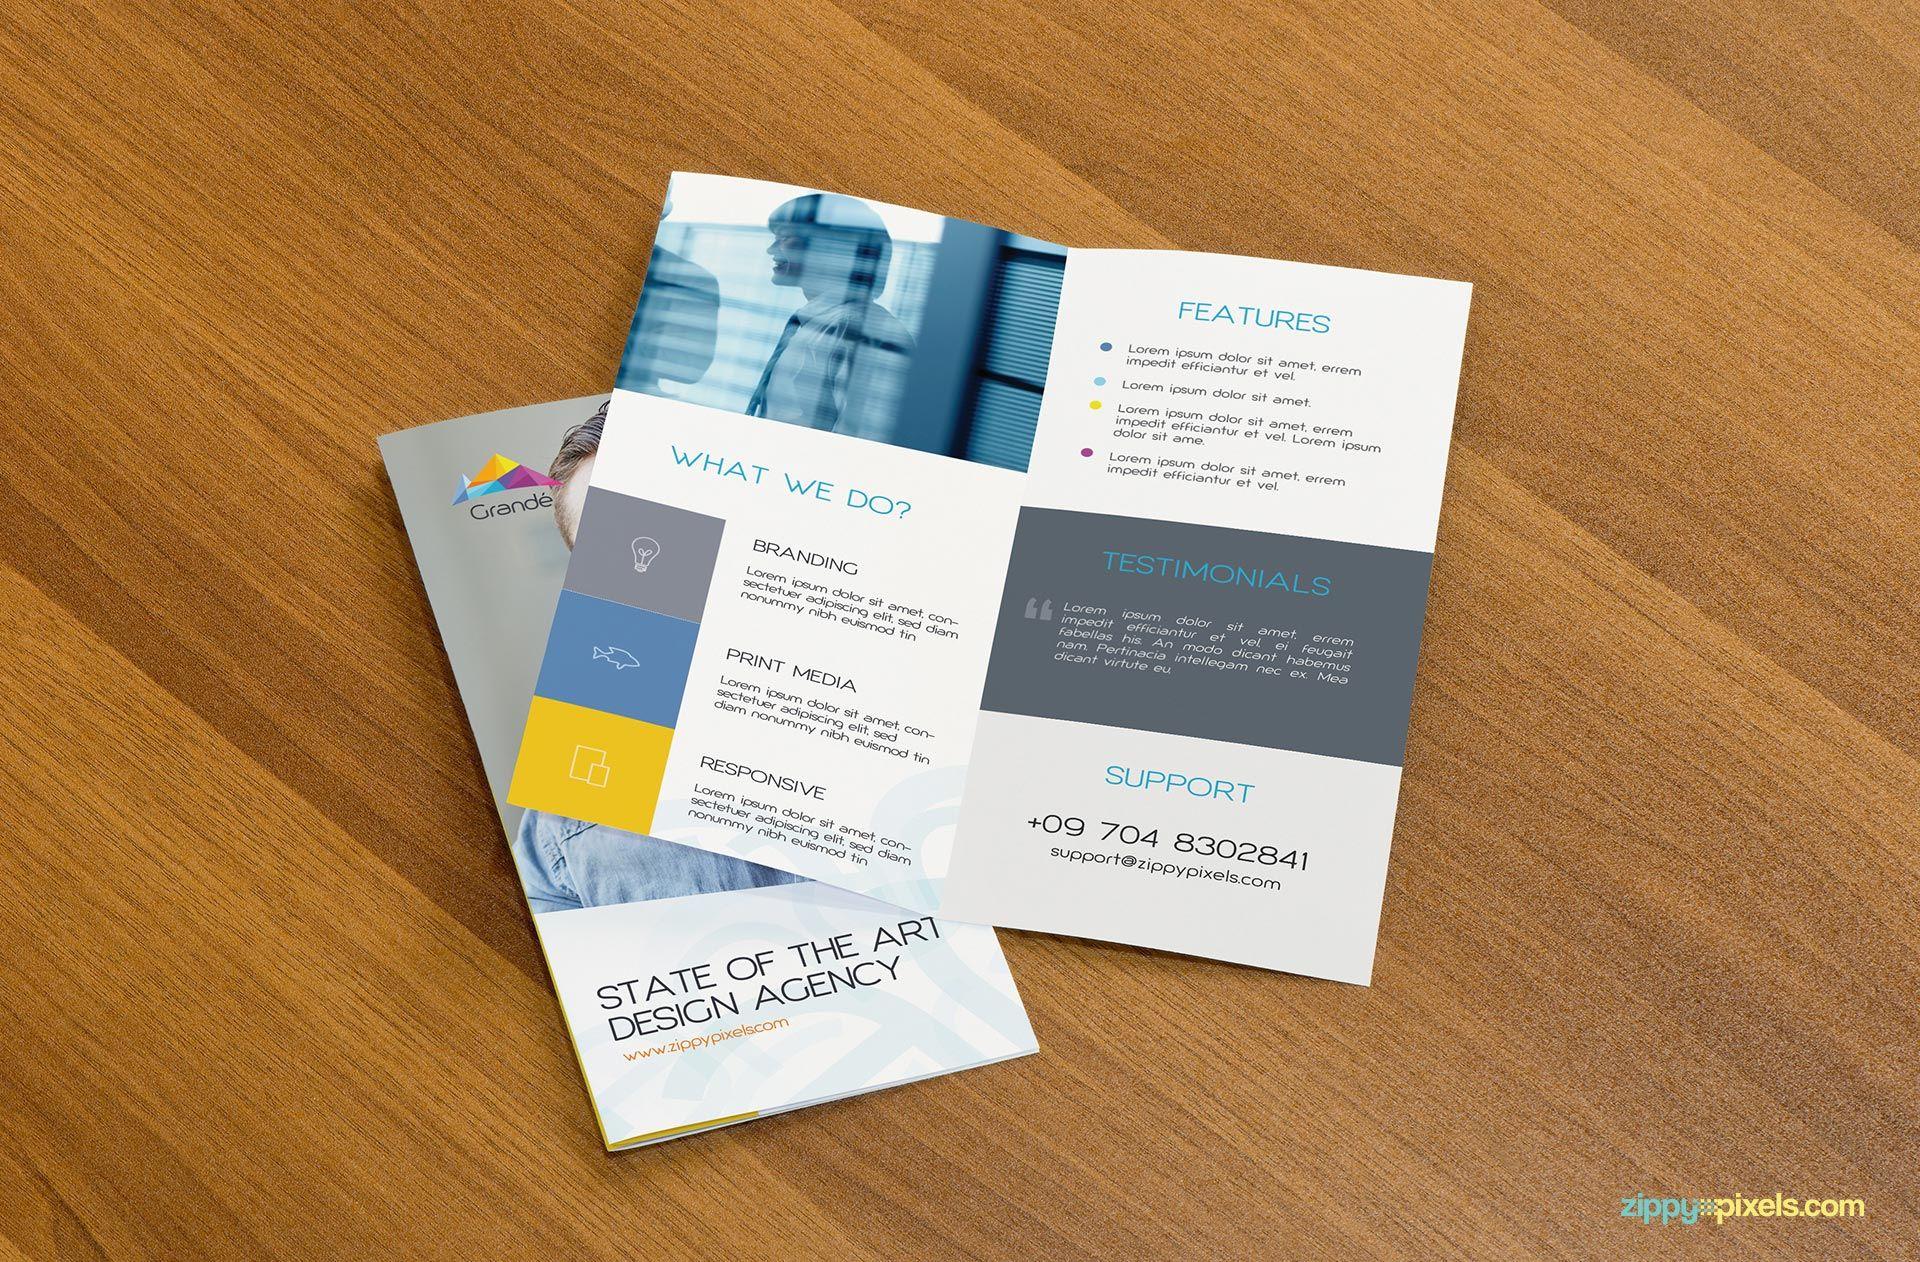 Menentukan warna per seksi · 5. Mockup Folder 3 Dobras Free Mockups Psd Template Design Assets